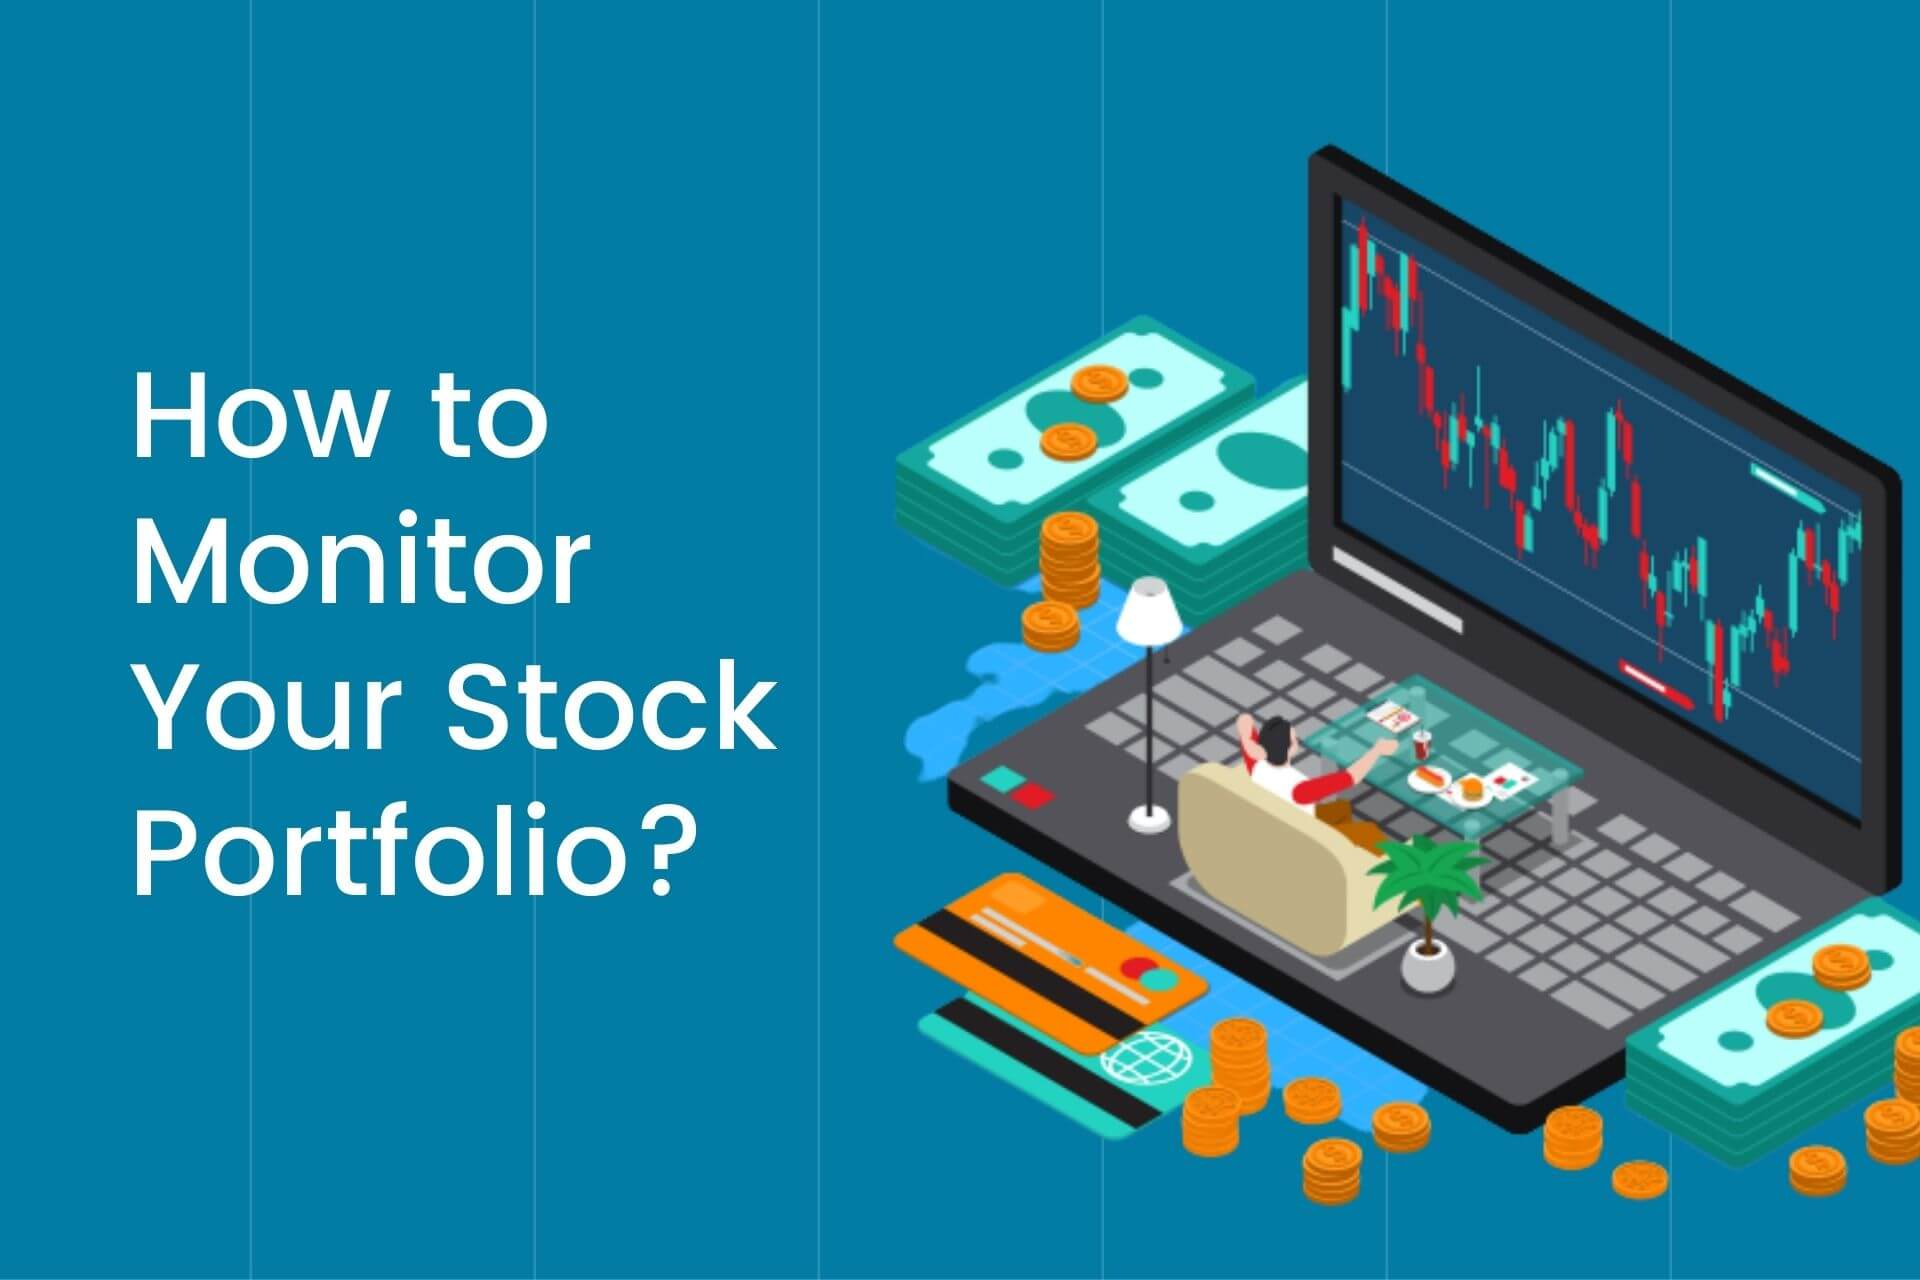 How to monitor your stock portfolio